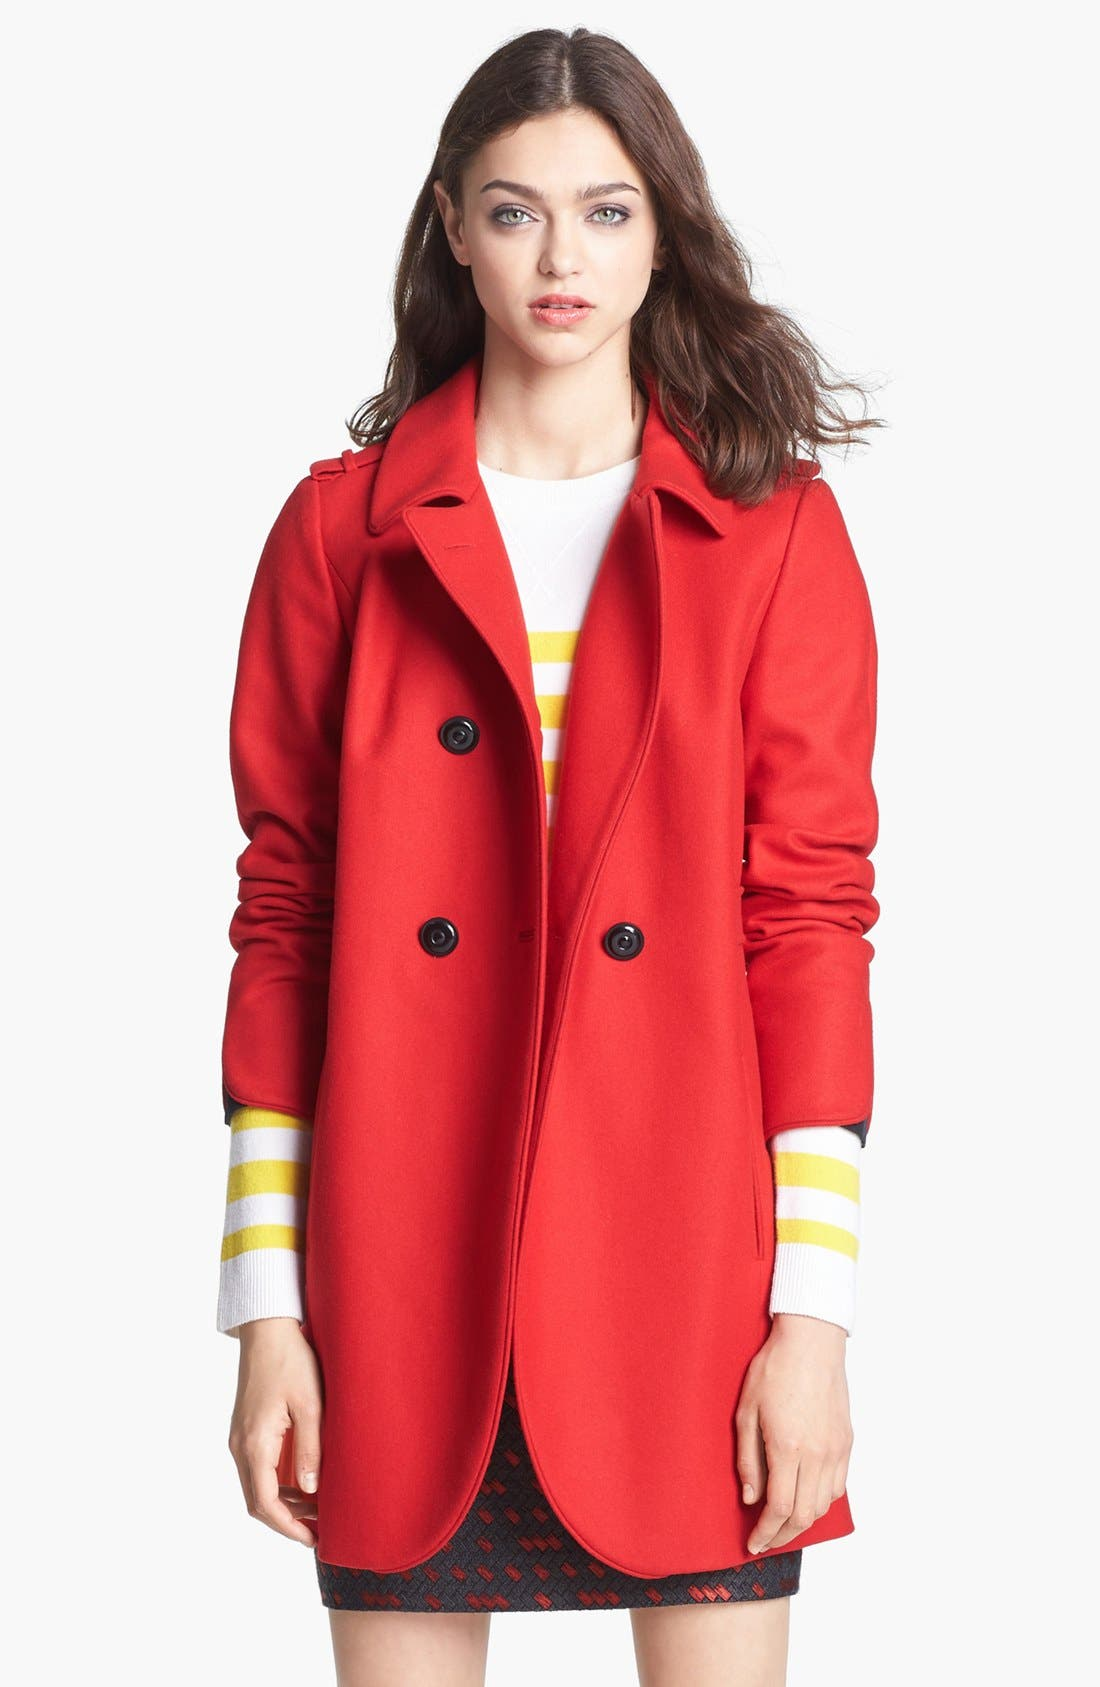 Alternate Image 1 Selected - Miss Wu 'Torre' Wool Blend Military Jacket (Nordstrom Exclusive)